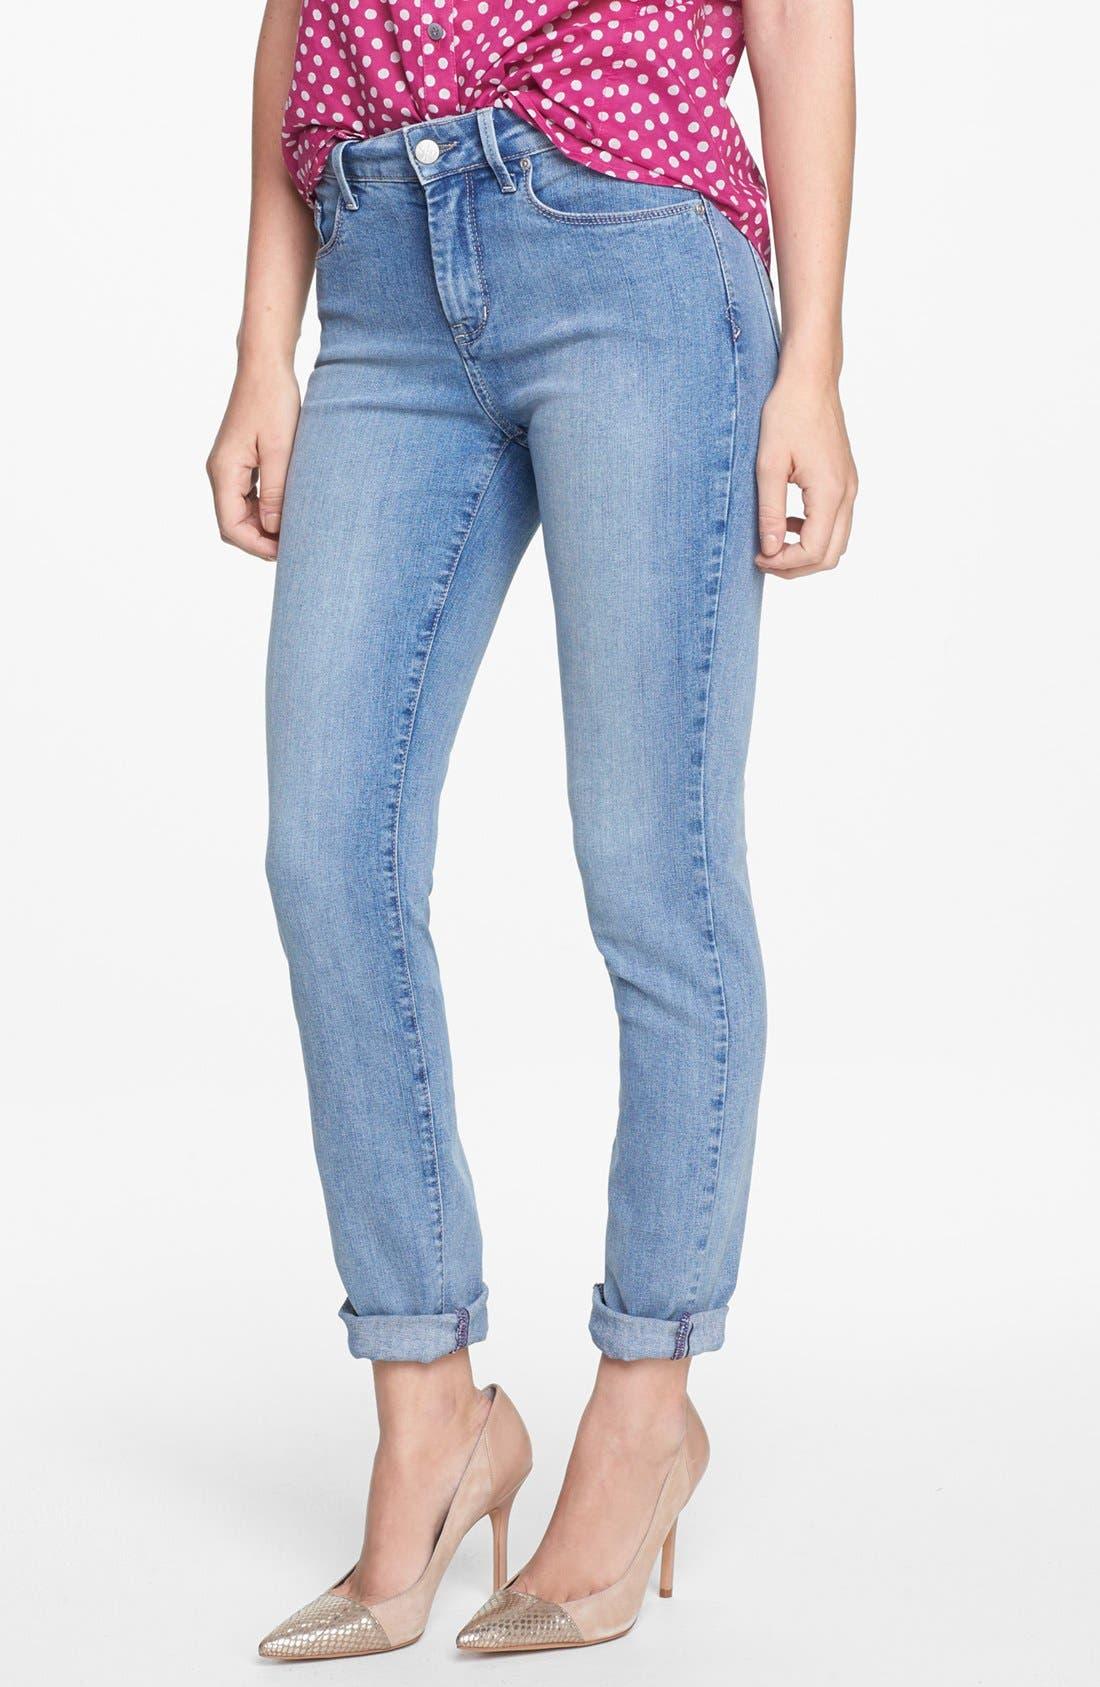 Alternate Image 1 Selected - NYDJ 'Anabelle' Stretch Skinny Jeans (Sacramento)